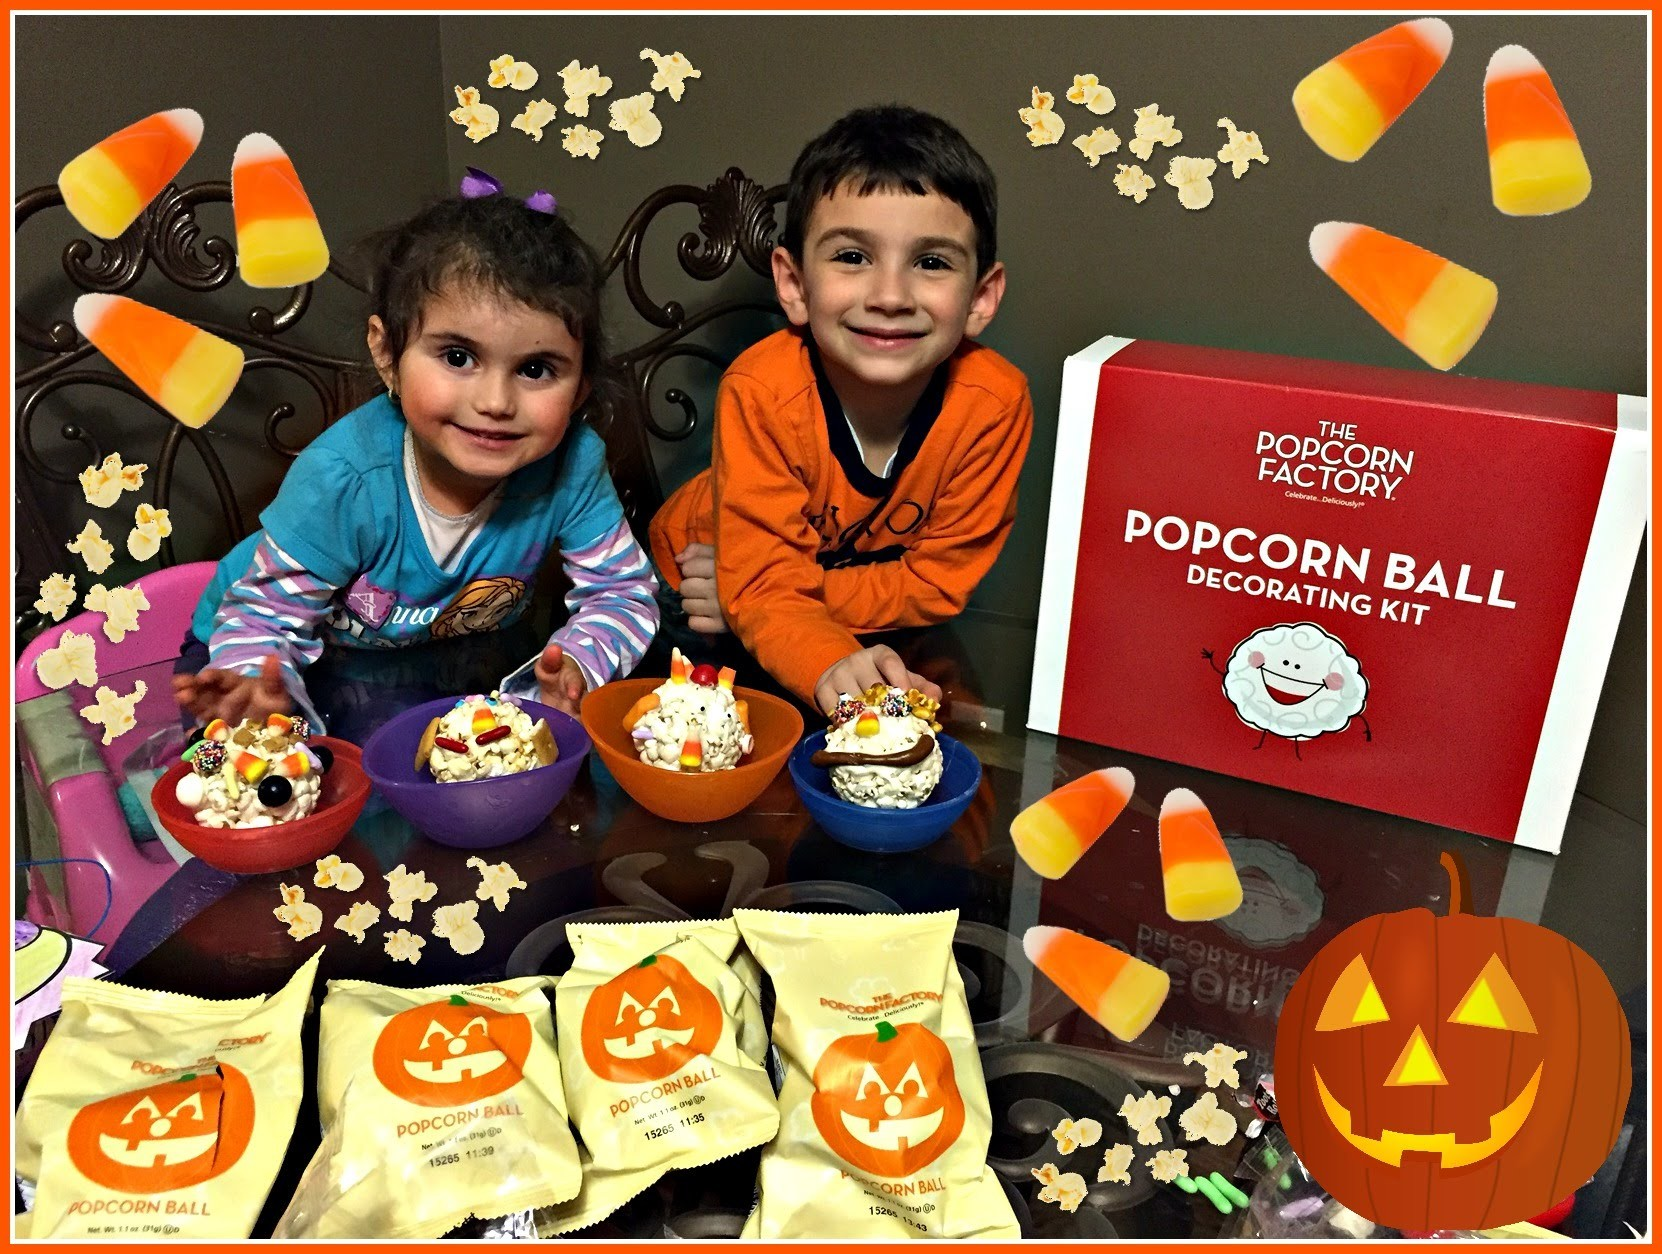 DIY Halloween Popcorn Ball Decorating Kit! Candy Corns, Tootsie Rolls & more!